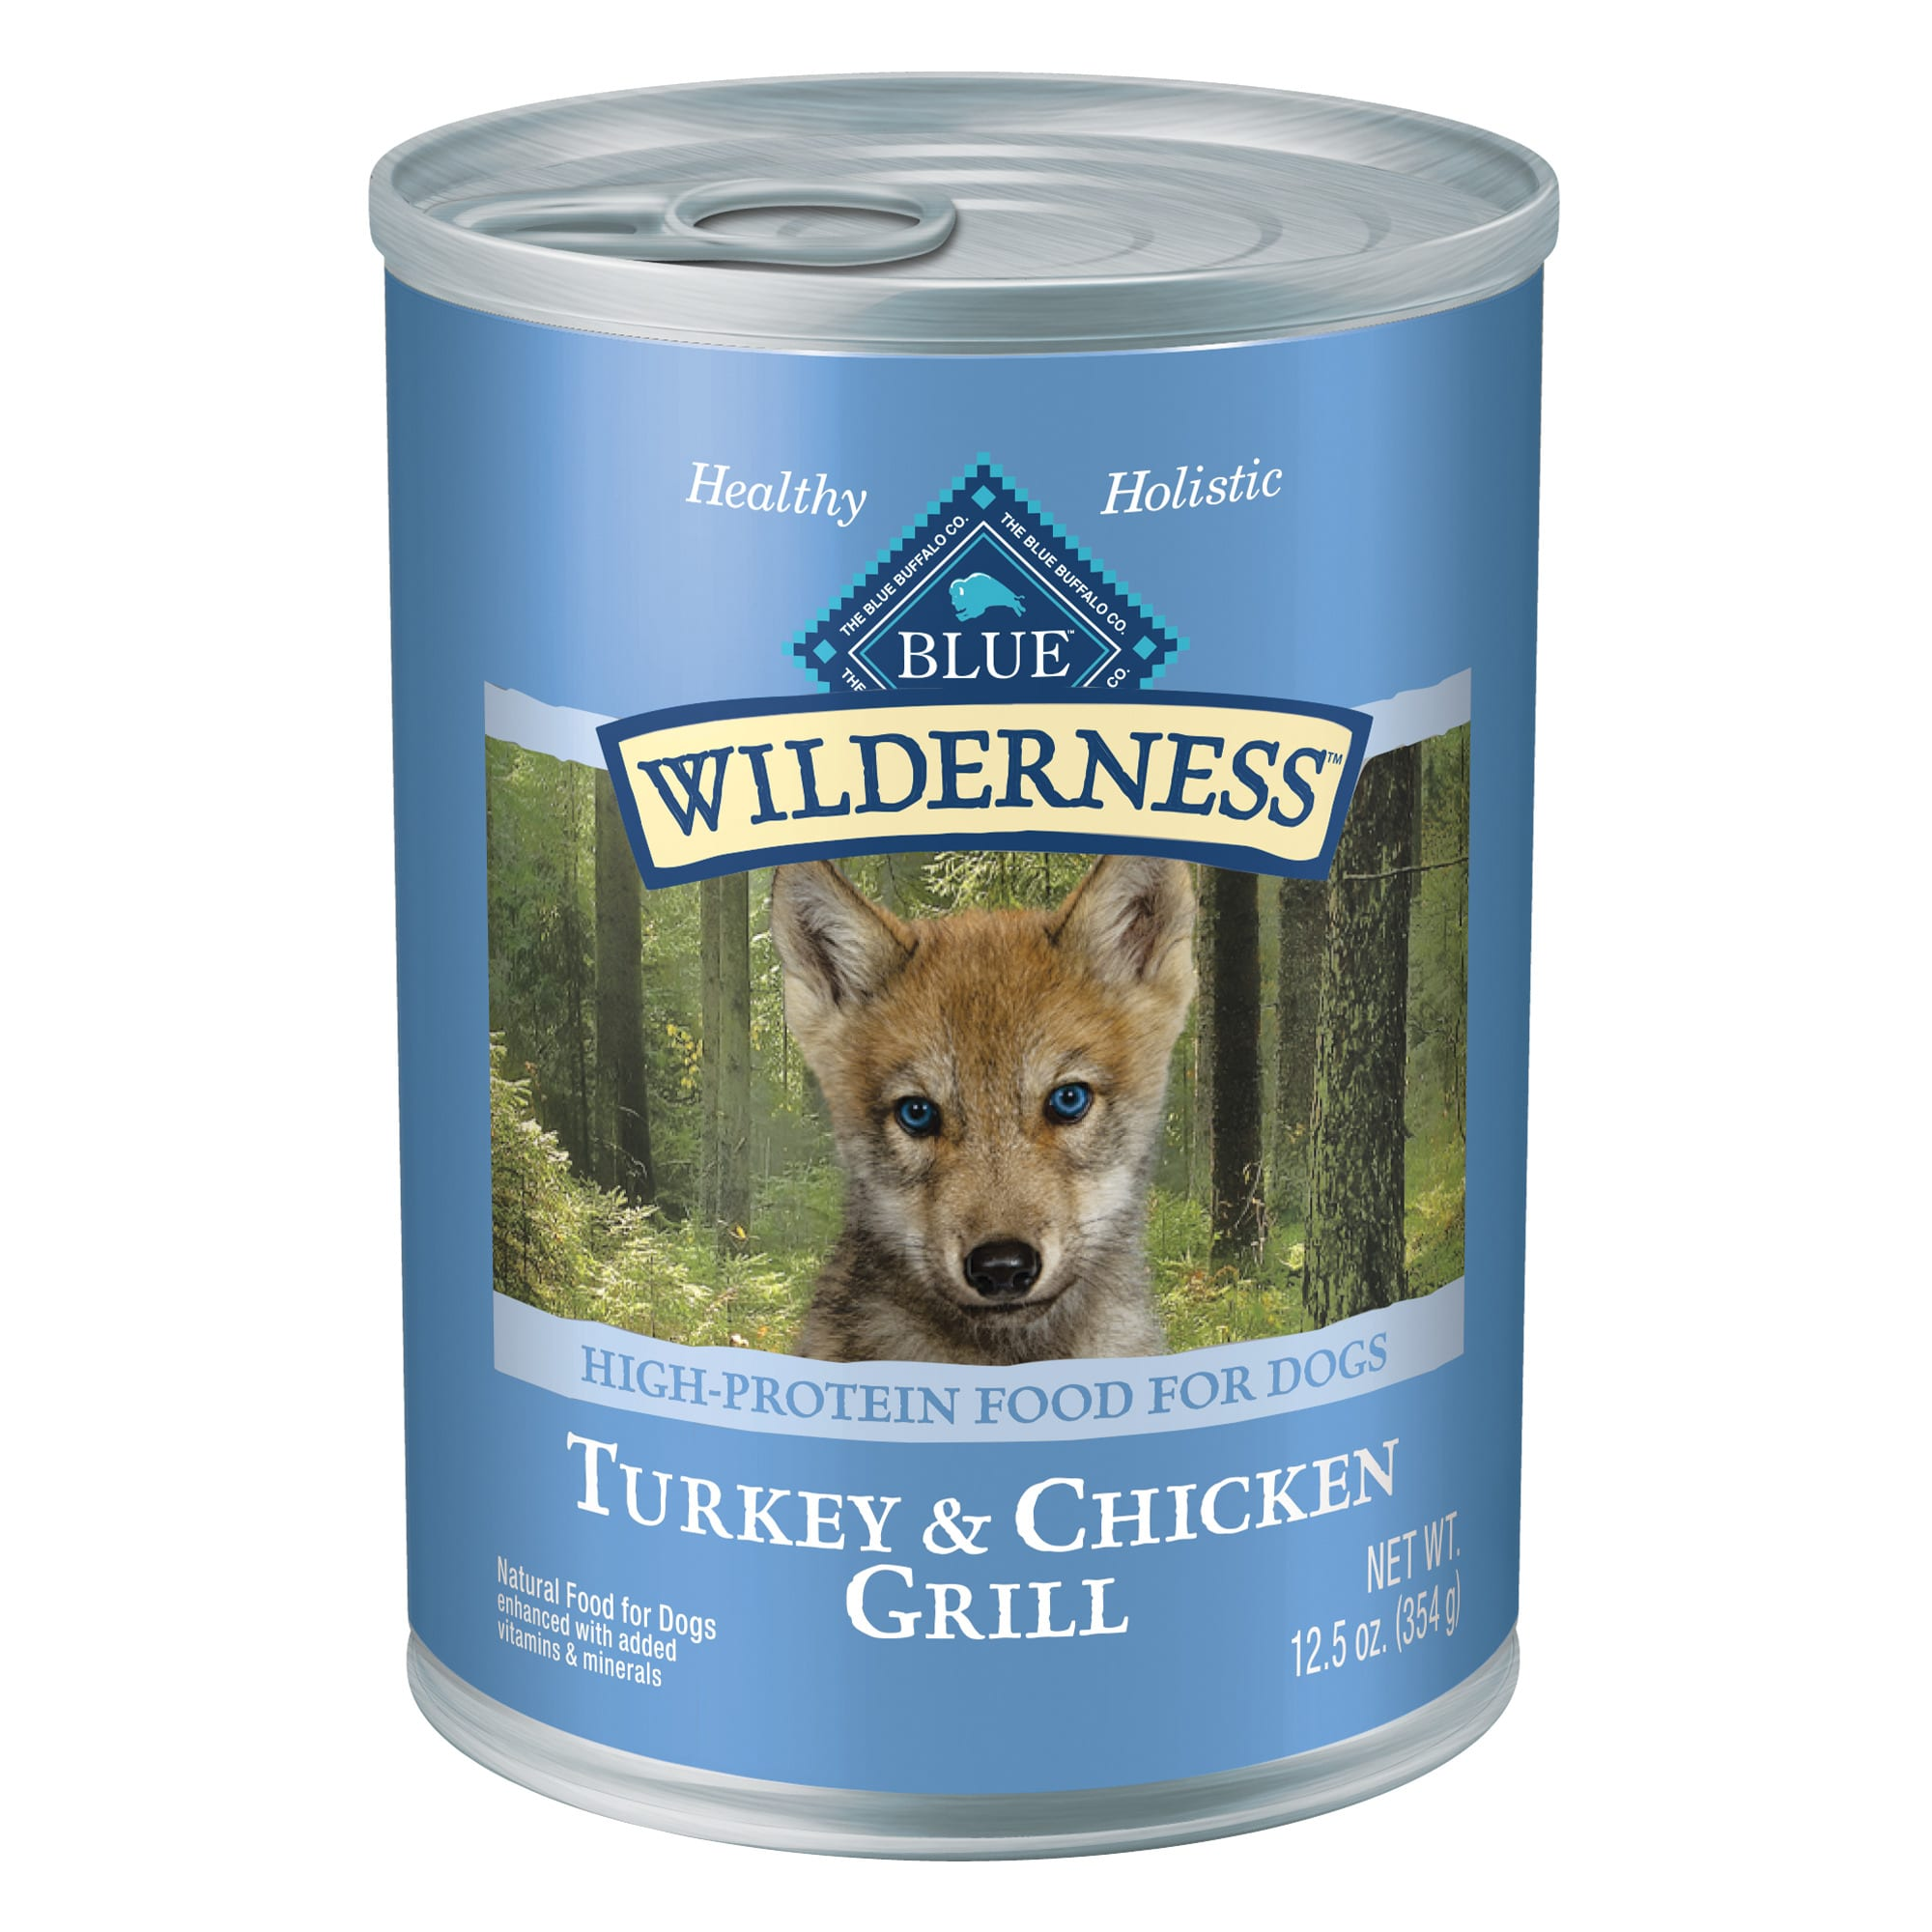 Blue Buffalo Blue Wilderness Puppy Turkey Chicken Grill Wet Dog Food 12 5 Oz Case Of 12 Petco